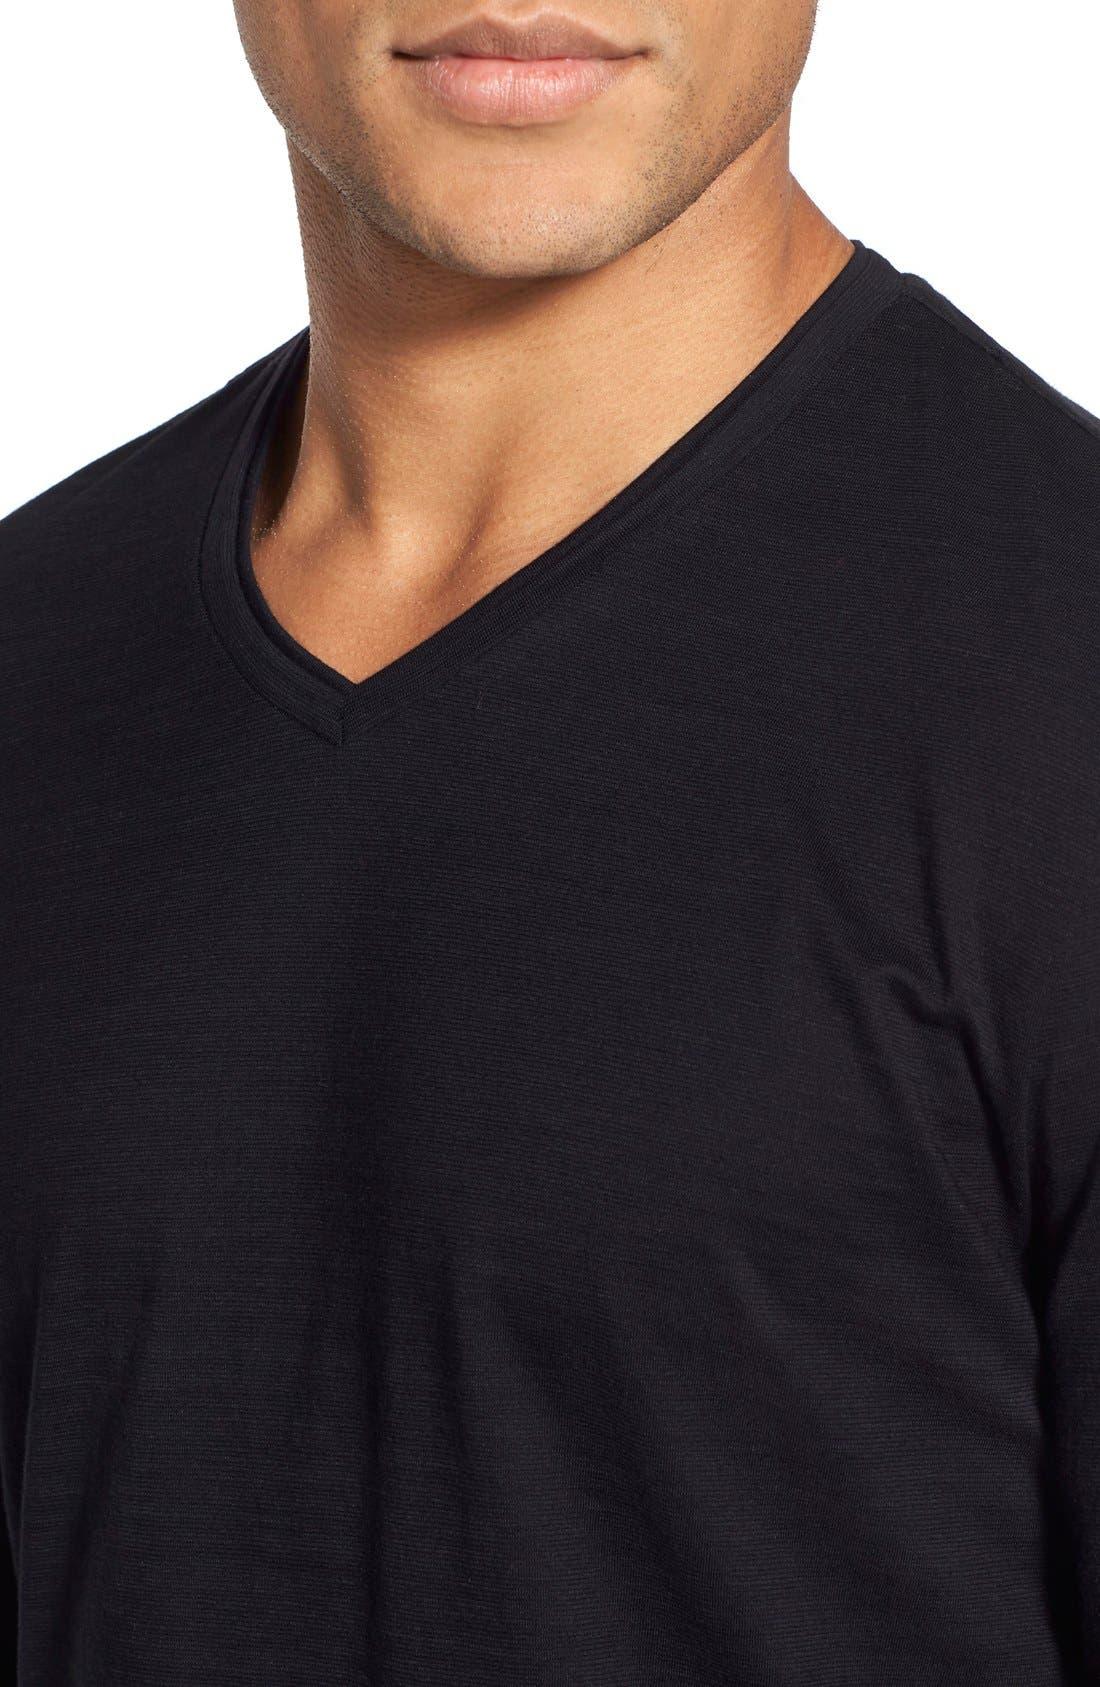 'Tyson' V-Neck Long Sleeve T-Shirt,                             Alternate thumbnail 4, color,                             001